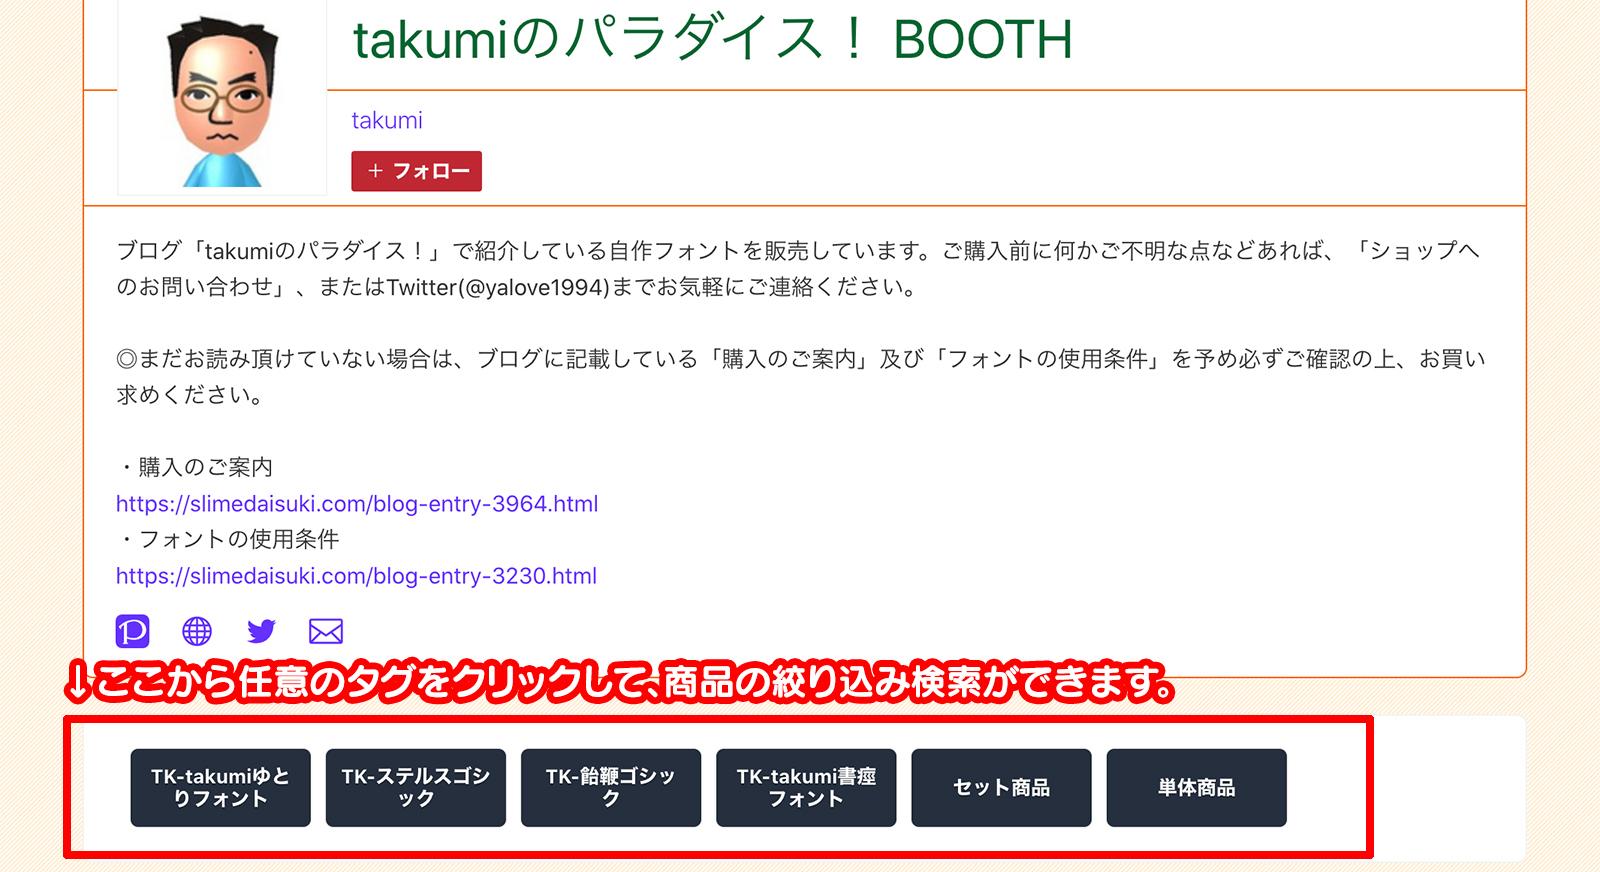 BOOTH_ShiborikomiList_20201225132148780.jpg